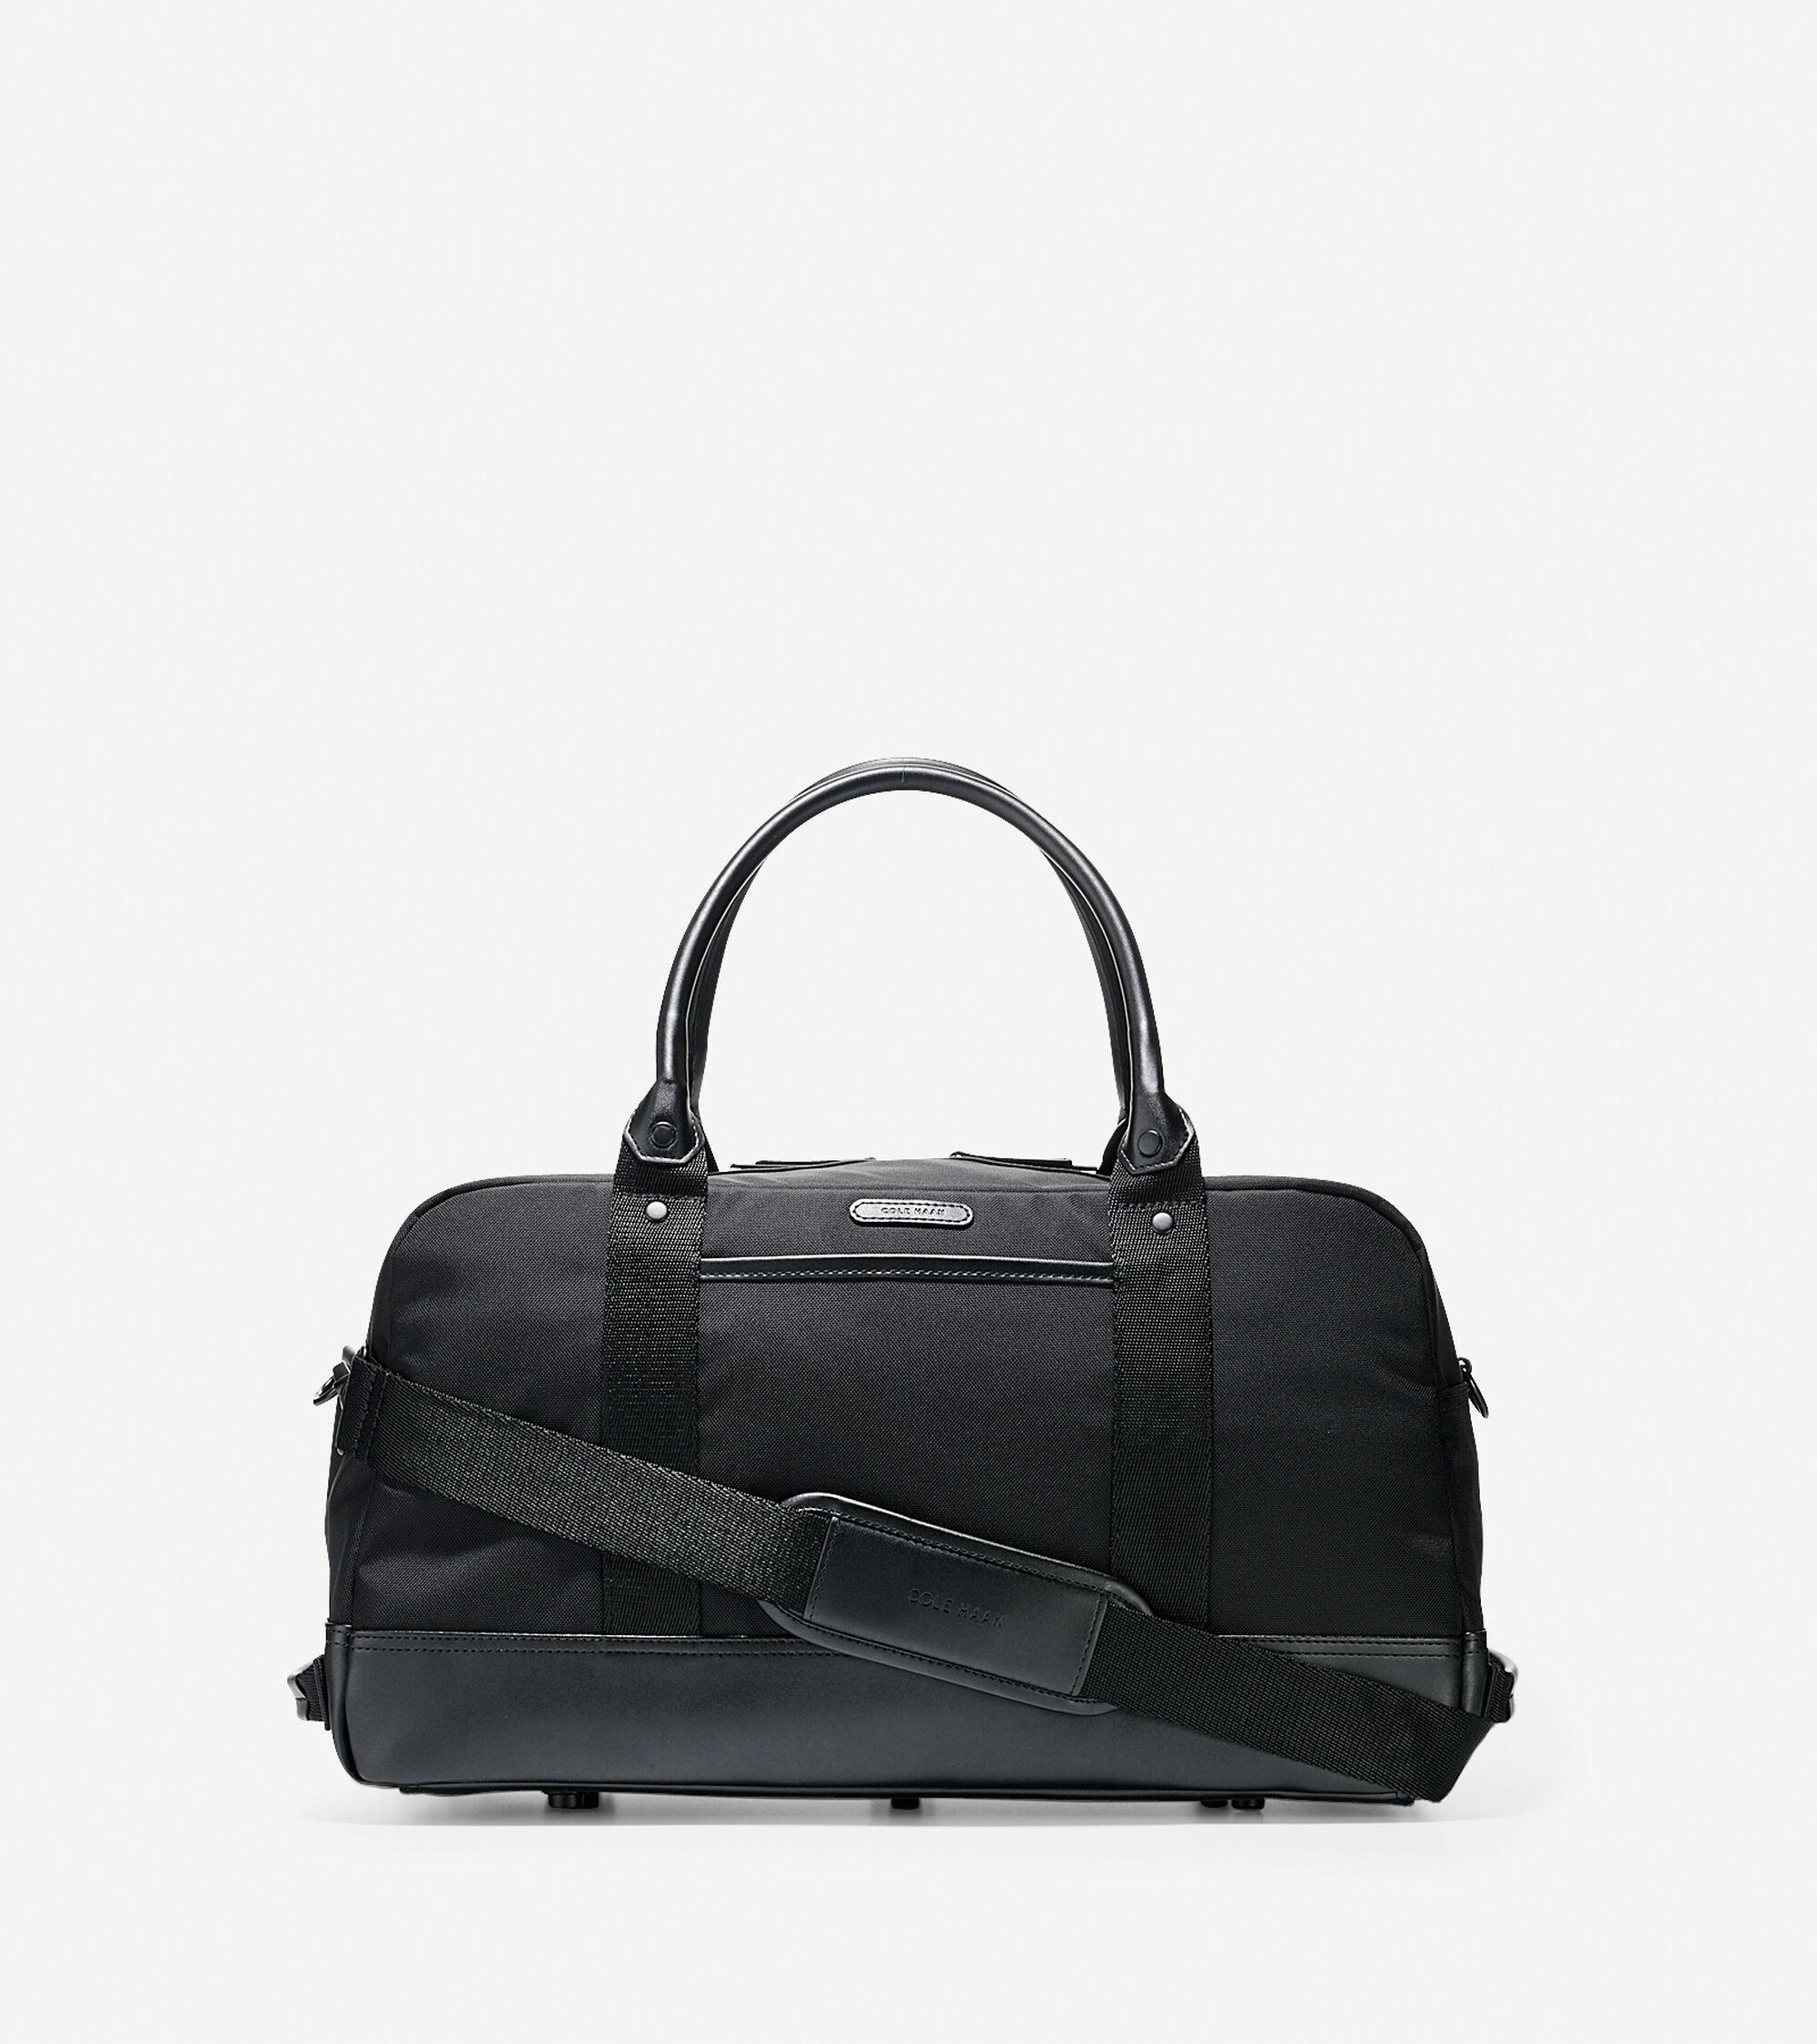 Briefs & Bags > Grand Small Duffle